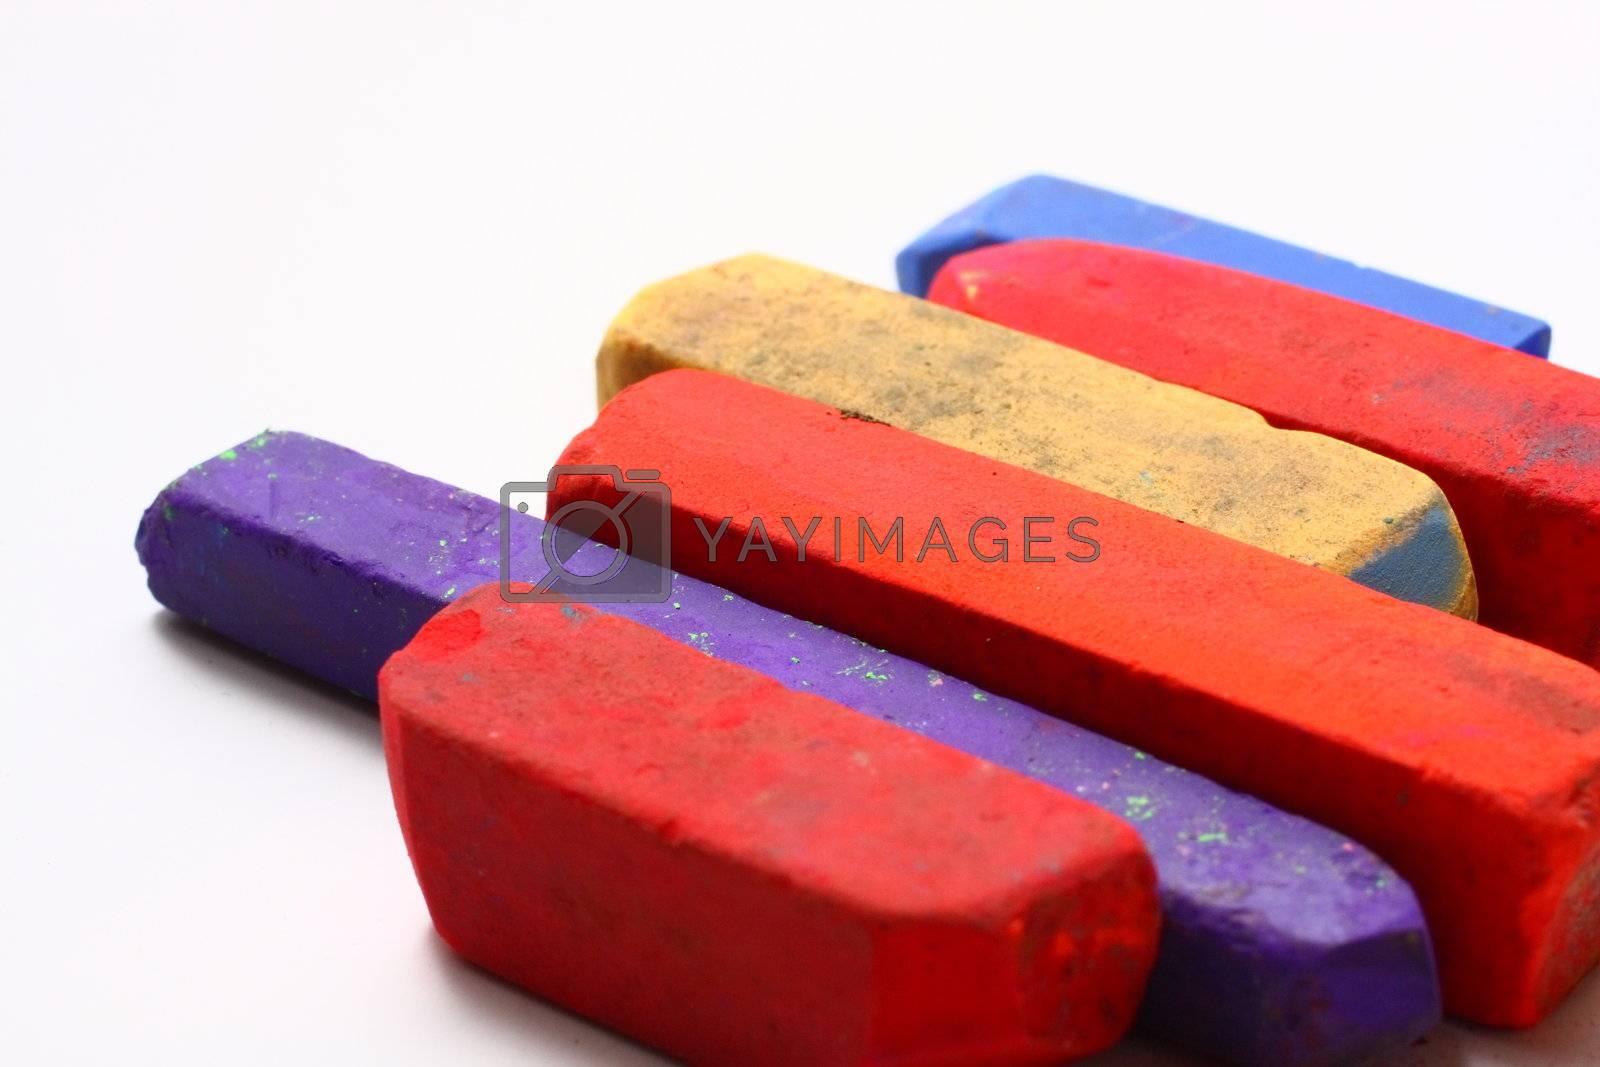 Colored Chalk Pastels by dersankt